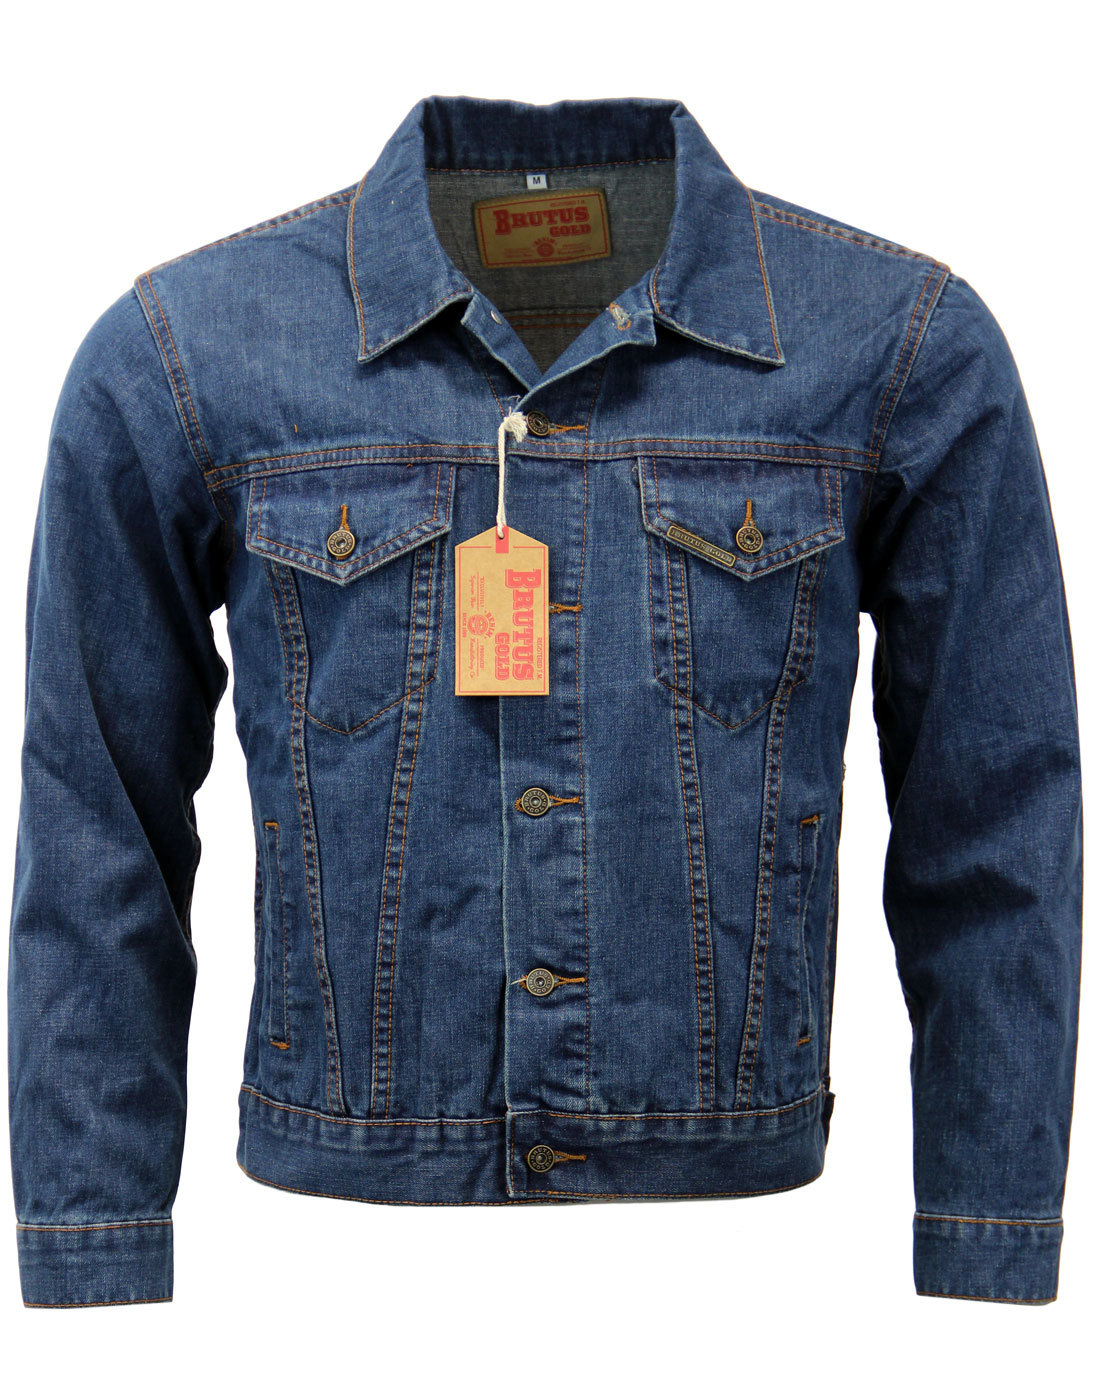 BRUTUS GOLD Retro Mod Blue Denim Trucker Jacket